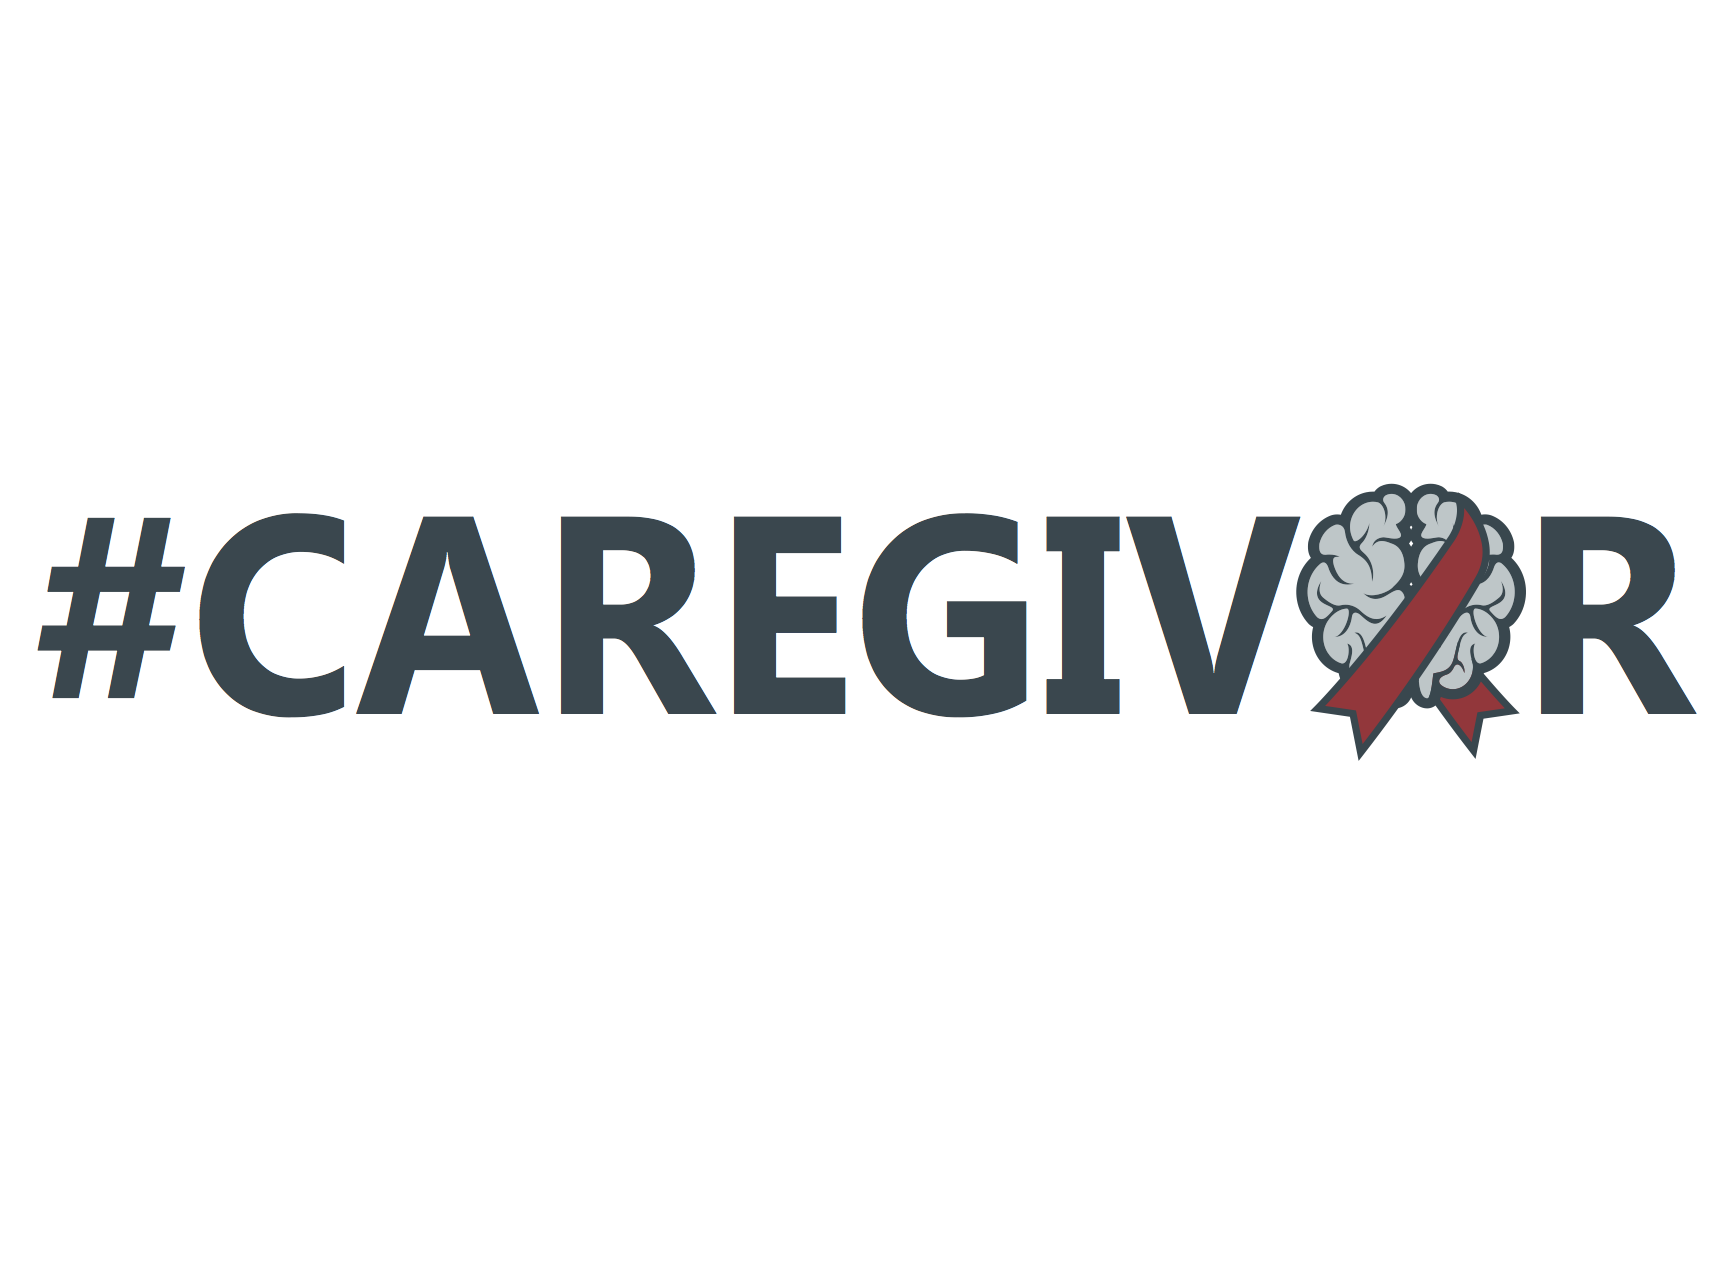 http://www.joeniekrofoundation.com/batter-up-for-brain-aneurysms/attachment/hashtag-caregiver-2/